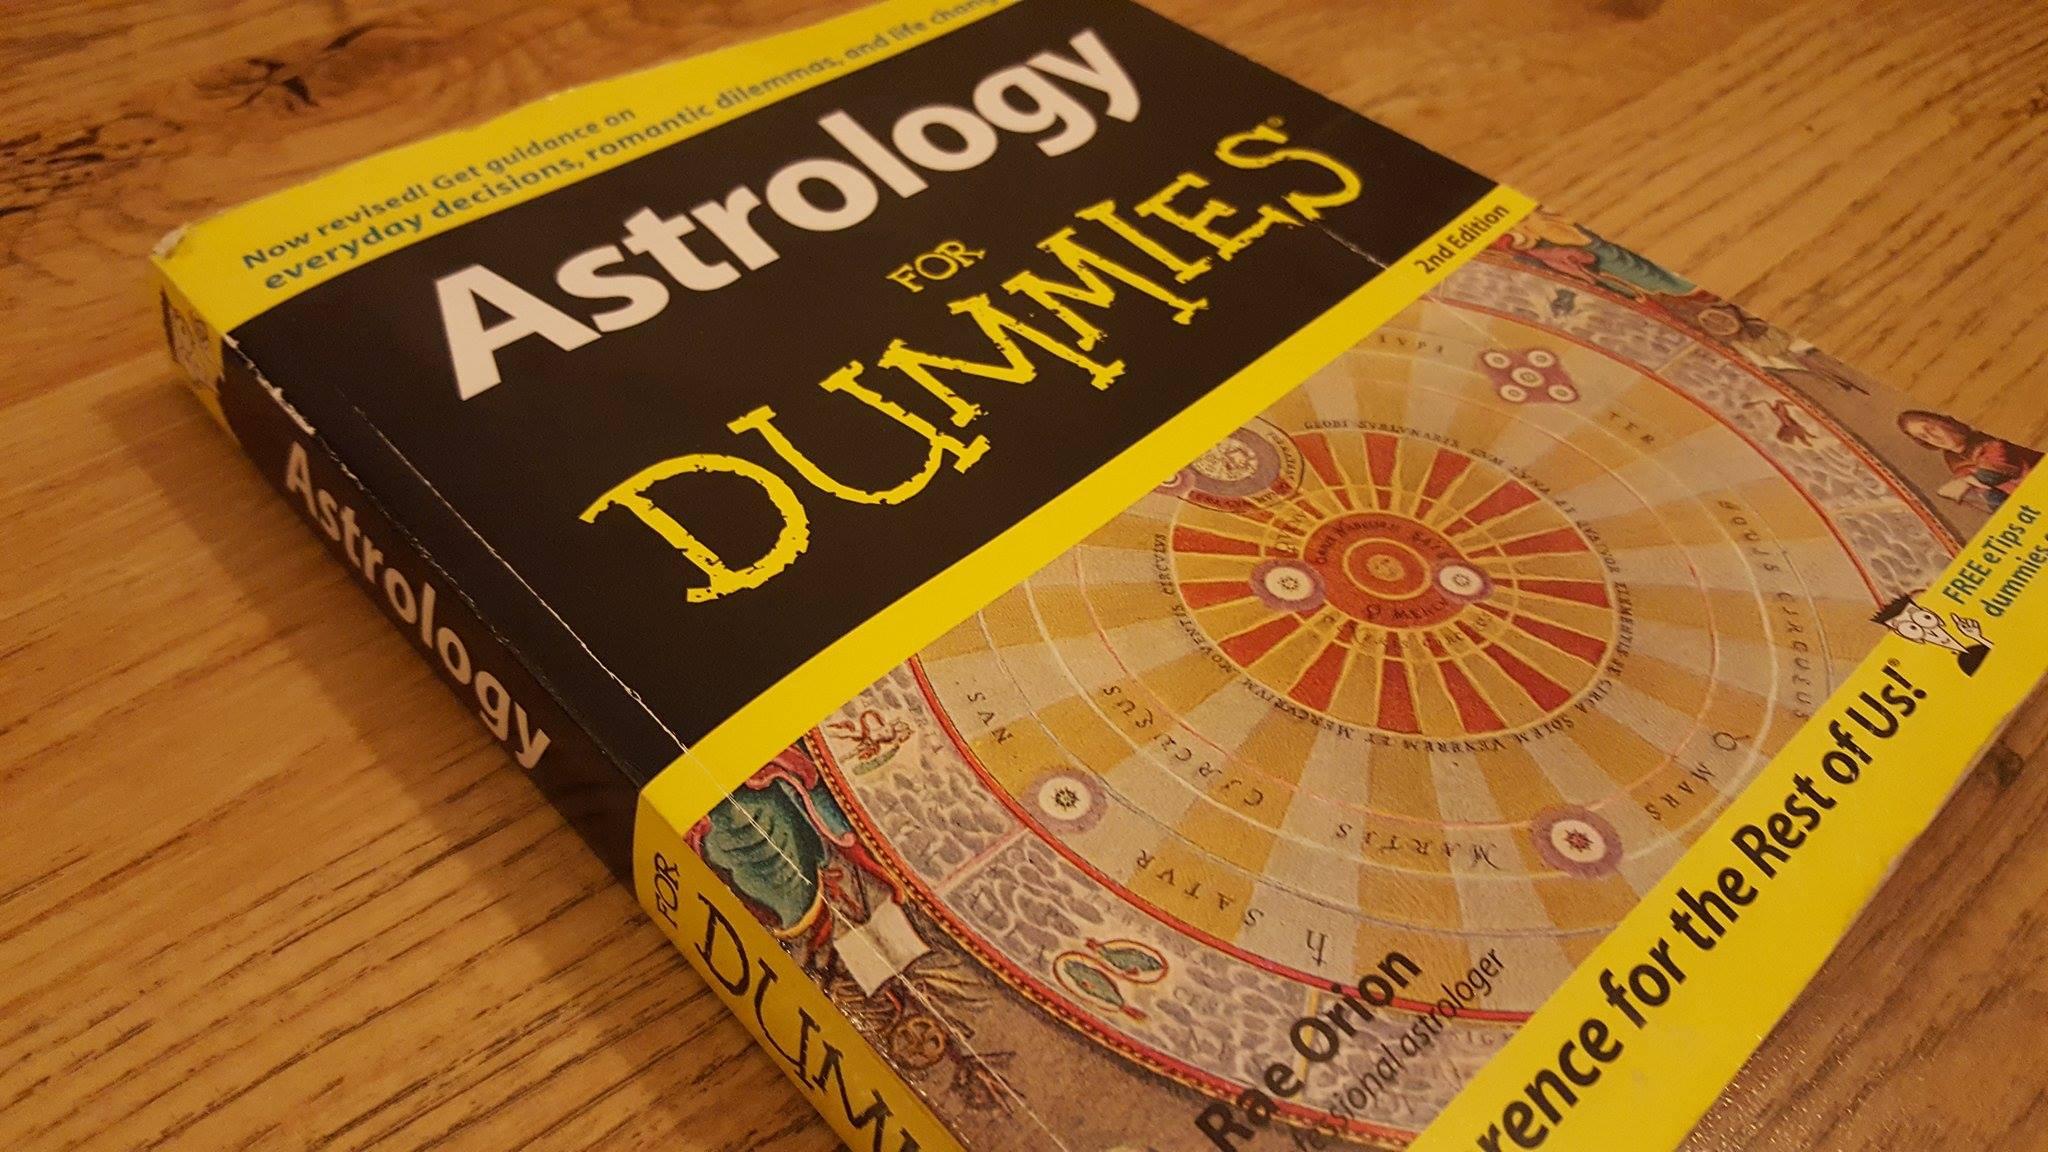 Why do we still read our horoscopes?